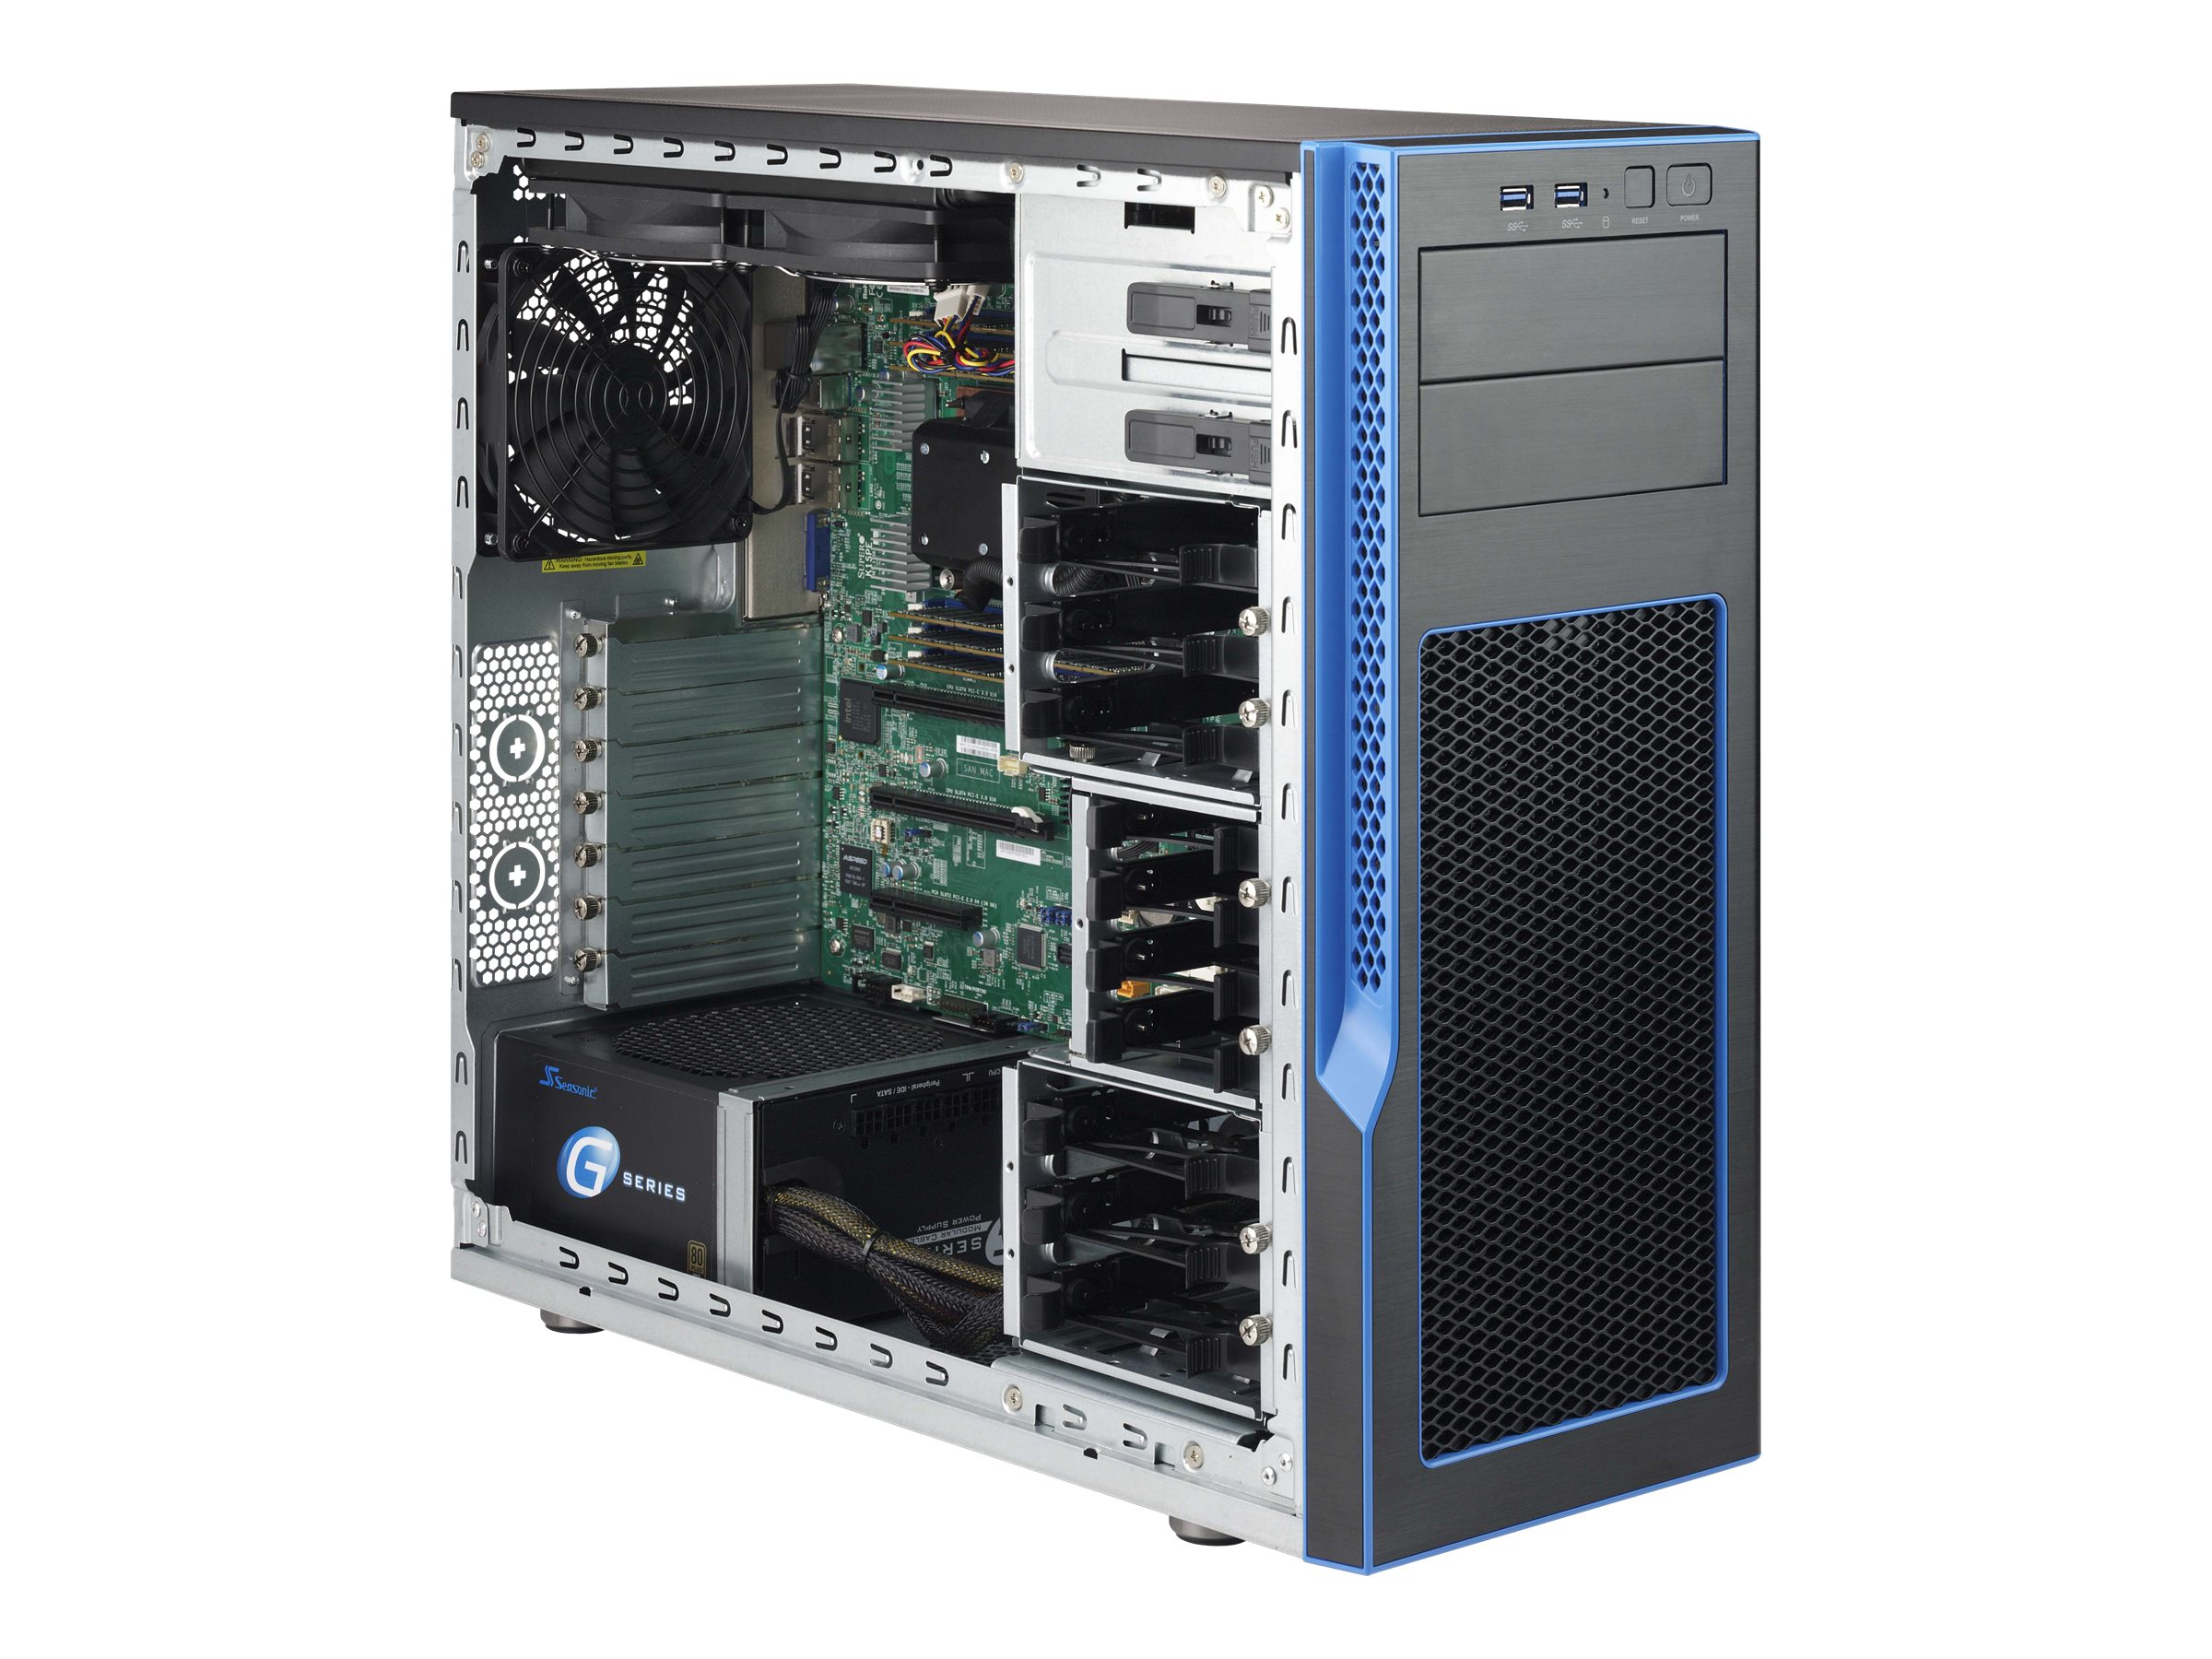 Supermicro CSE GS5A-753B - Tower - ATX 750 Watt (PS/2) - Grau, Schwarz - USB